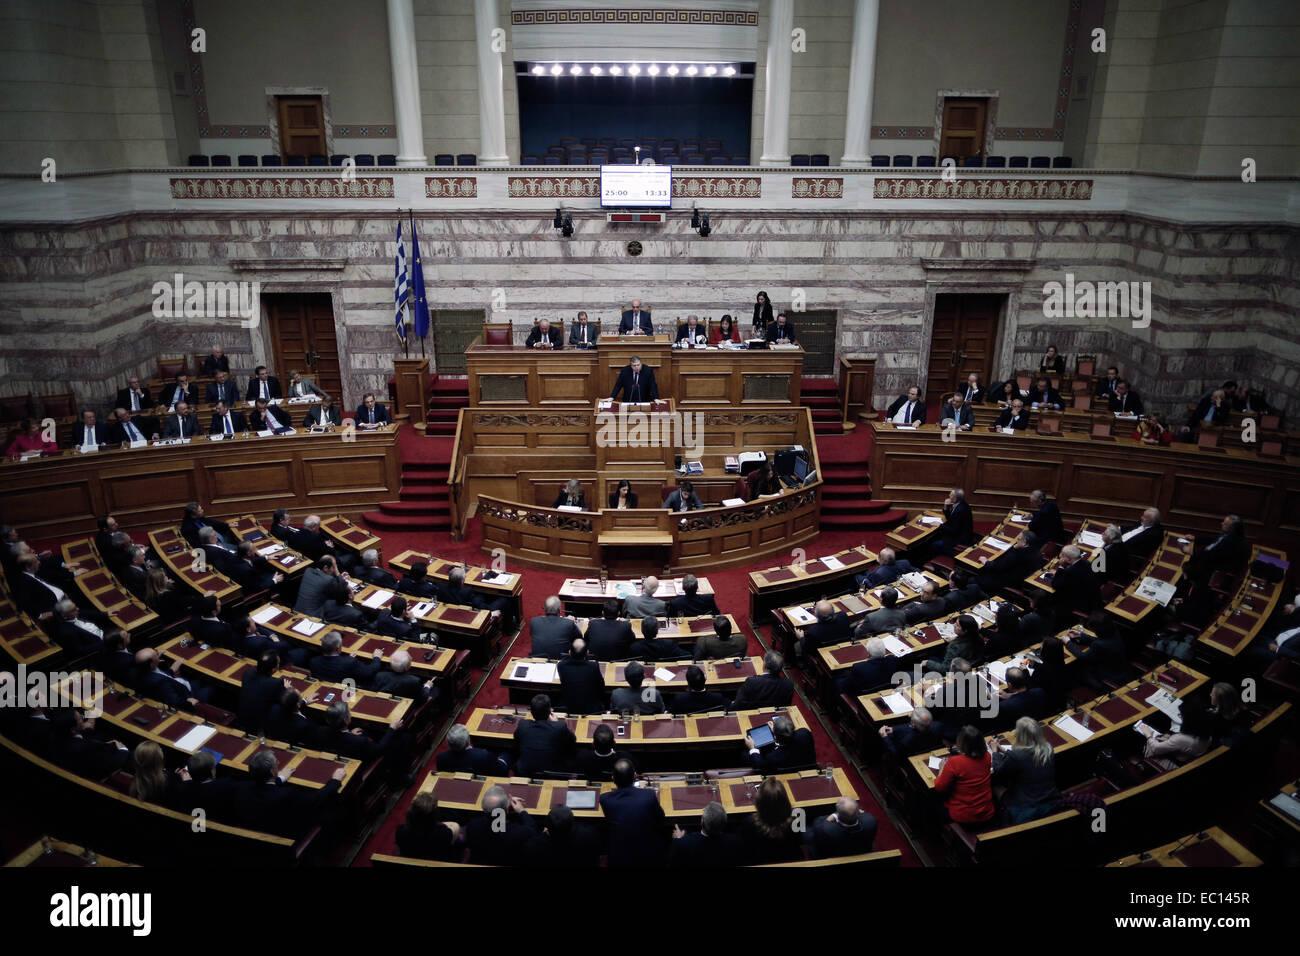 Athens, Greece. 07th Dec, 2014. The Greek parliament Credit:  Konstantinos Tsakalidis/Alamy Live News - Stock Image